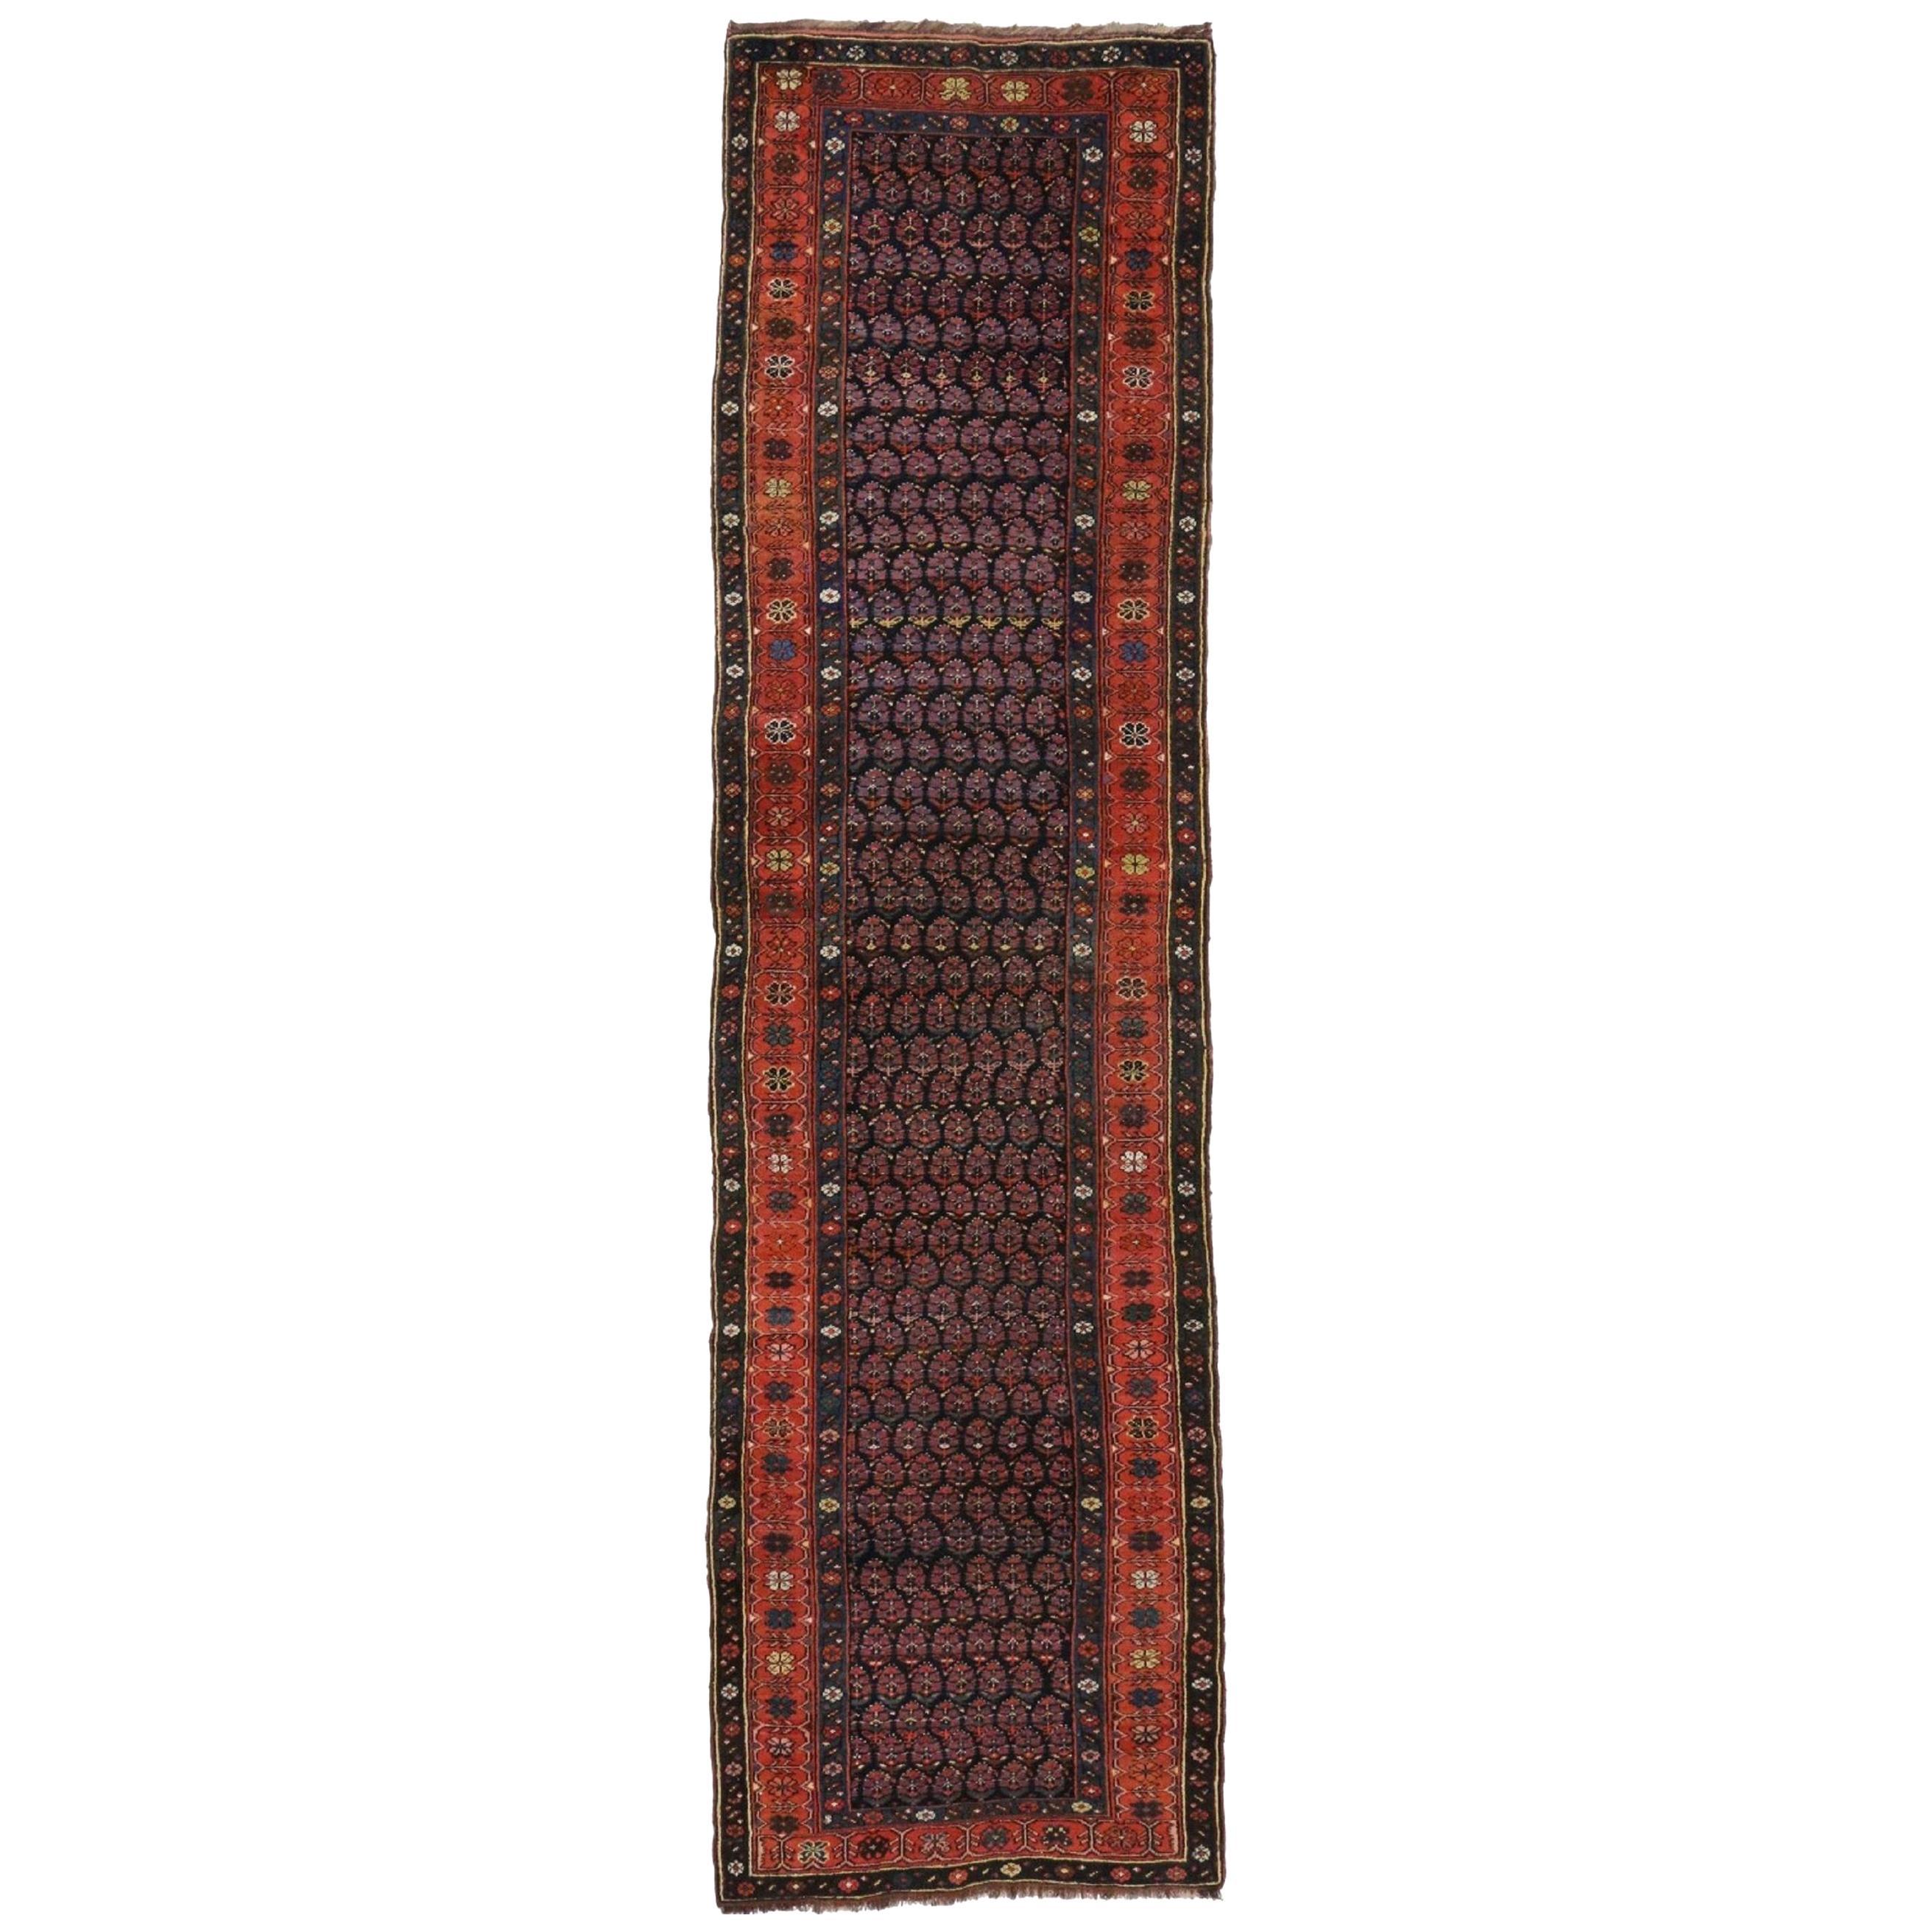 Antique Persian Kurdish Runner with Boteh Design, Hallway Runner